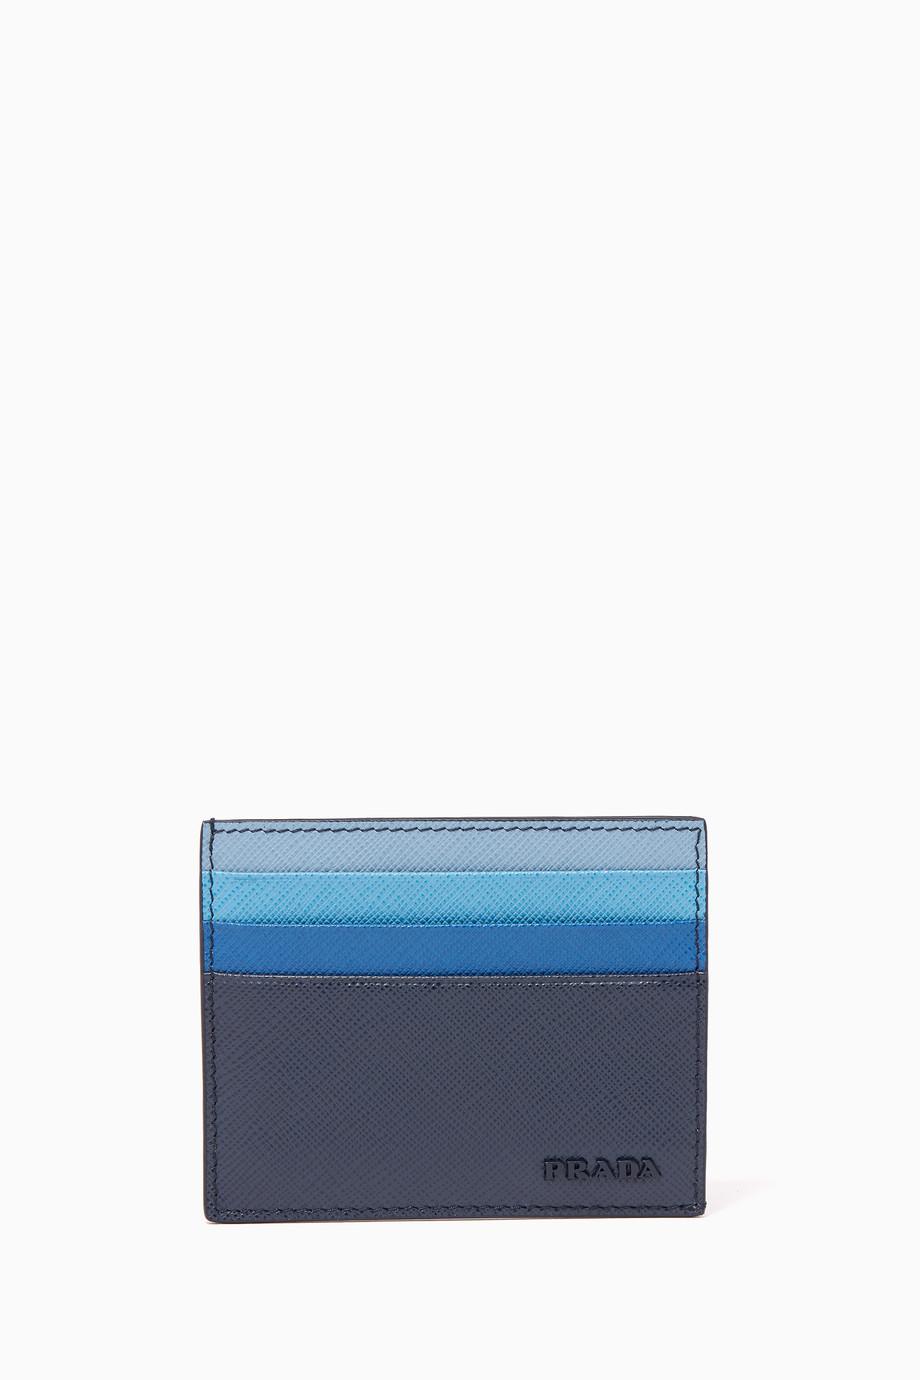 f1a293d70947 Shop Prada Blue Dark-Blue Gradient Saffiano Leather Card Holder for ...